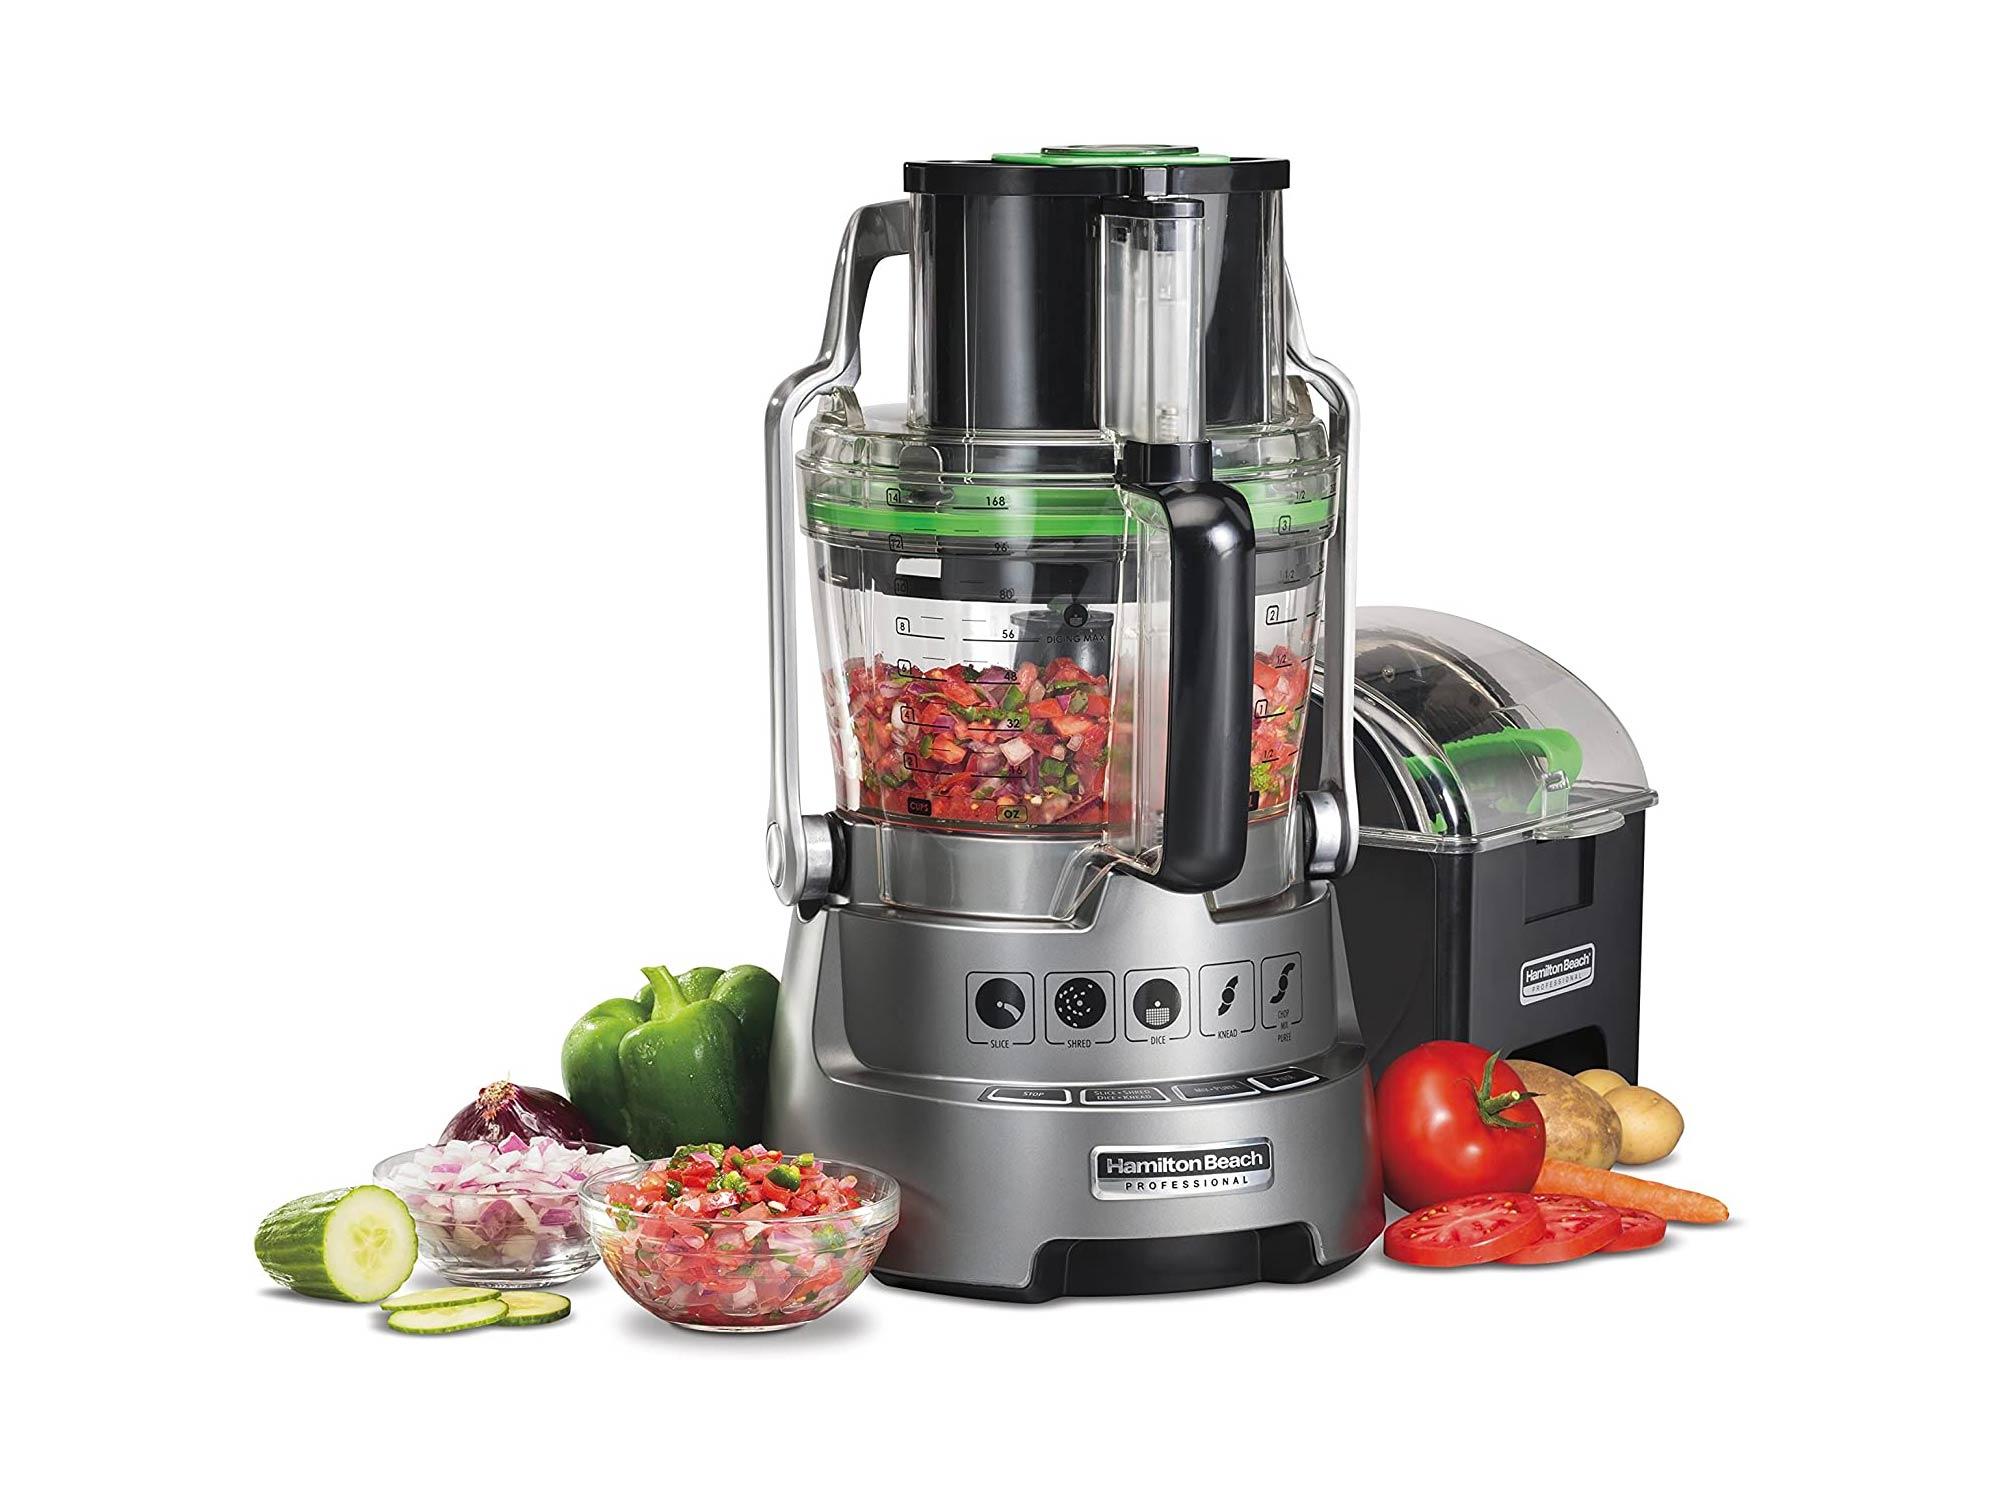 Hamilton Beach Professional 14-Cup Dicing Food Processor BPA-Free Bowl, Extra-Wide Feed Chute